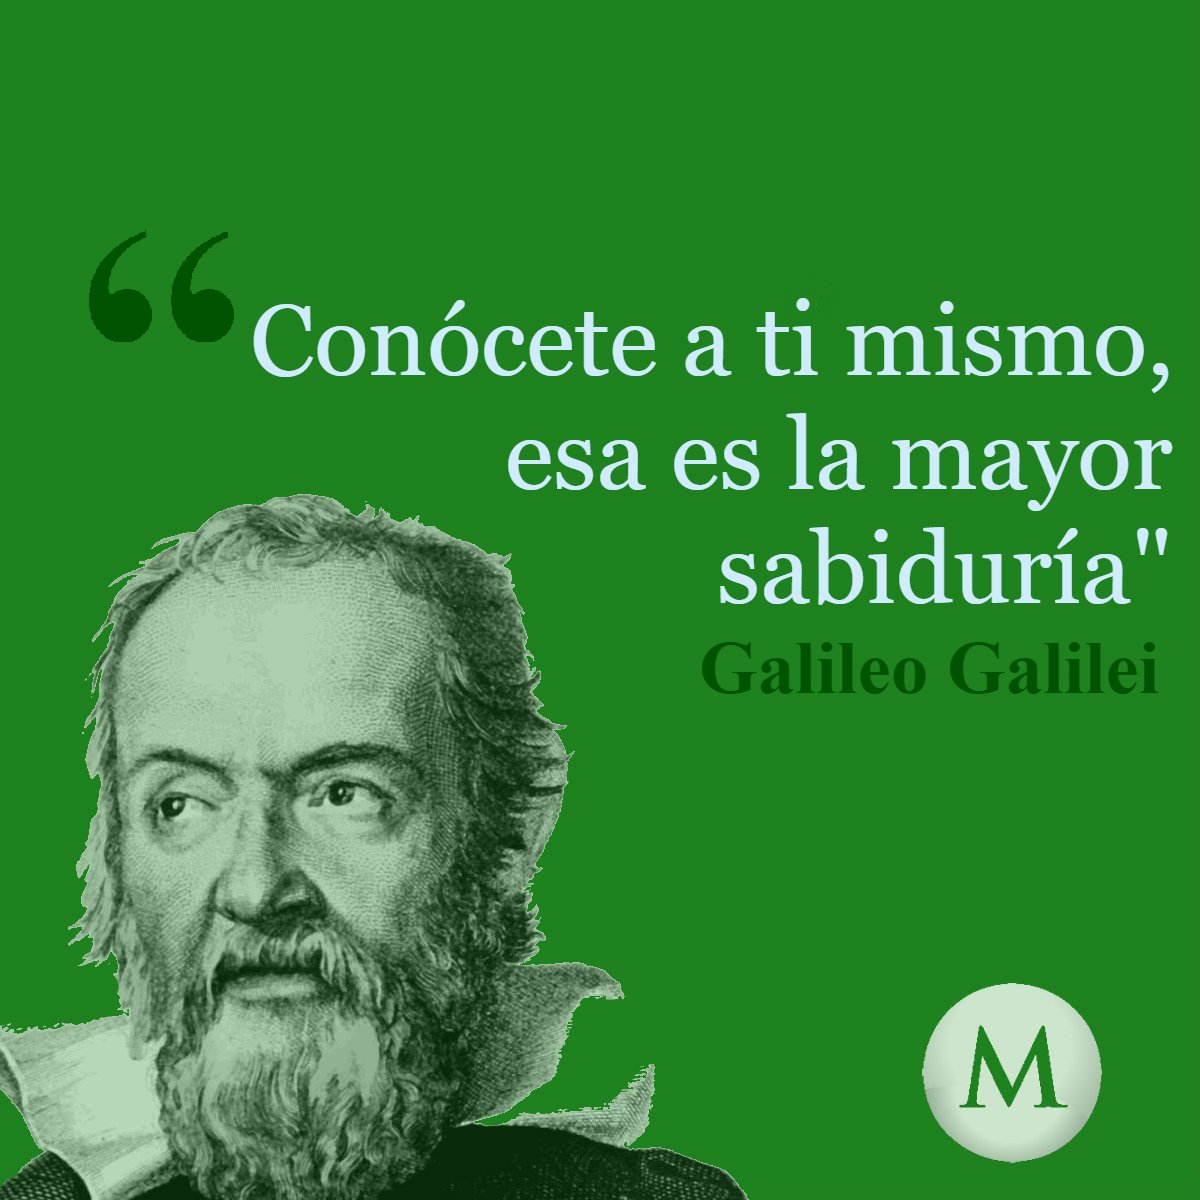 Mileniocom в Twitter La Forma De Galileo Galilei De Ver